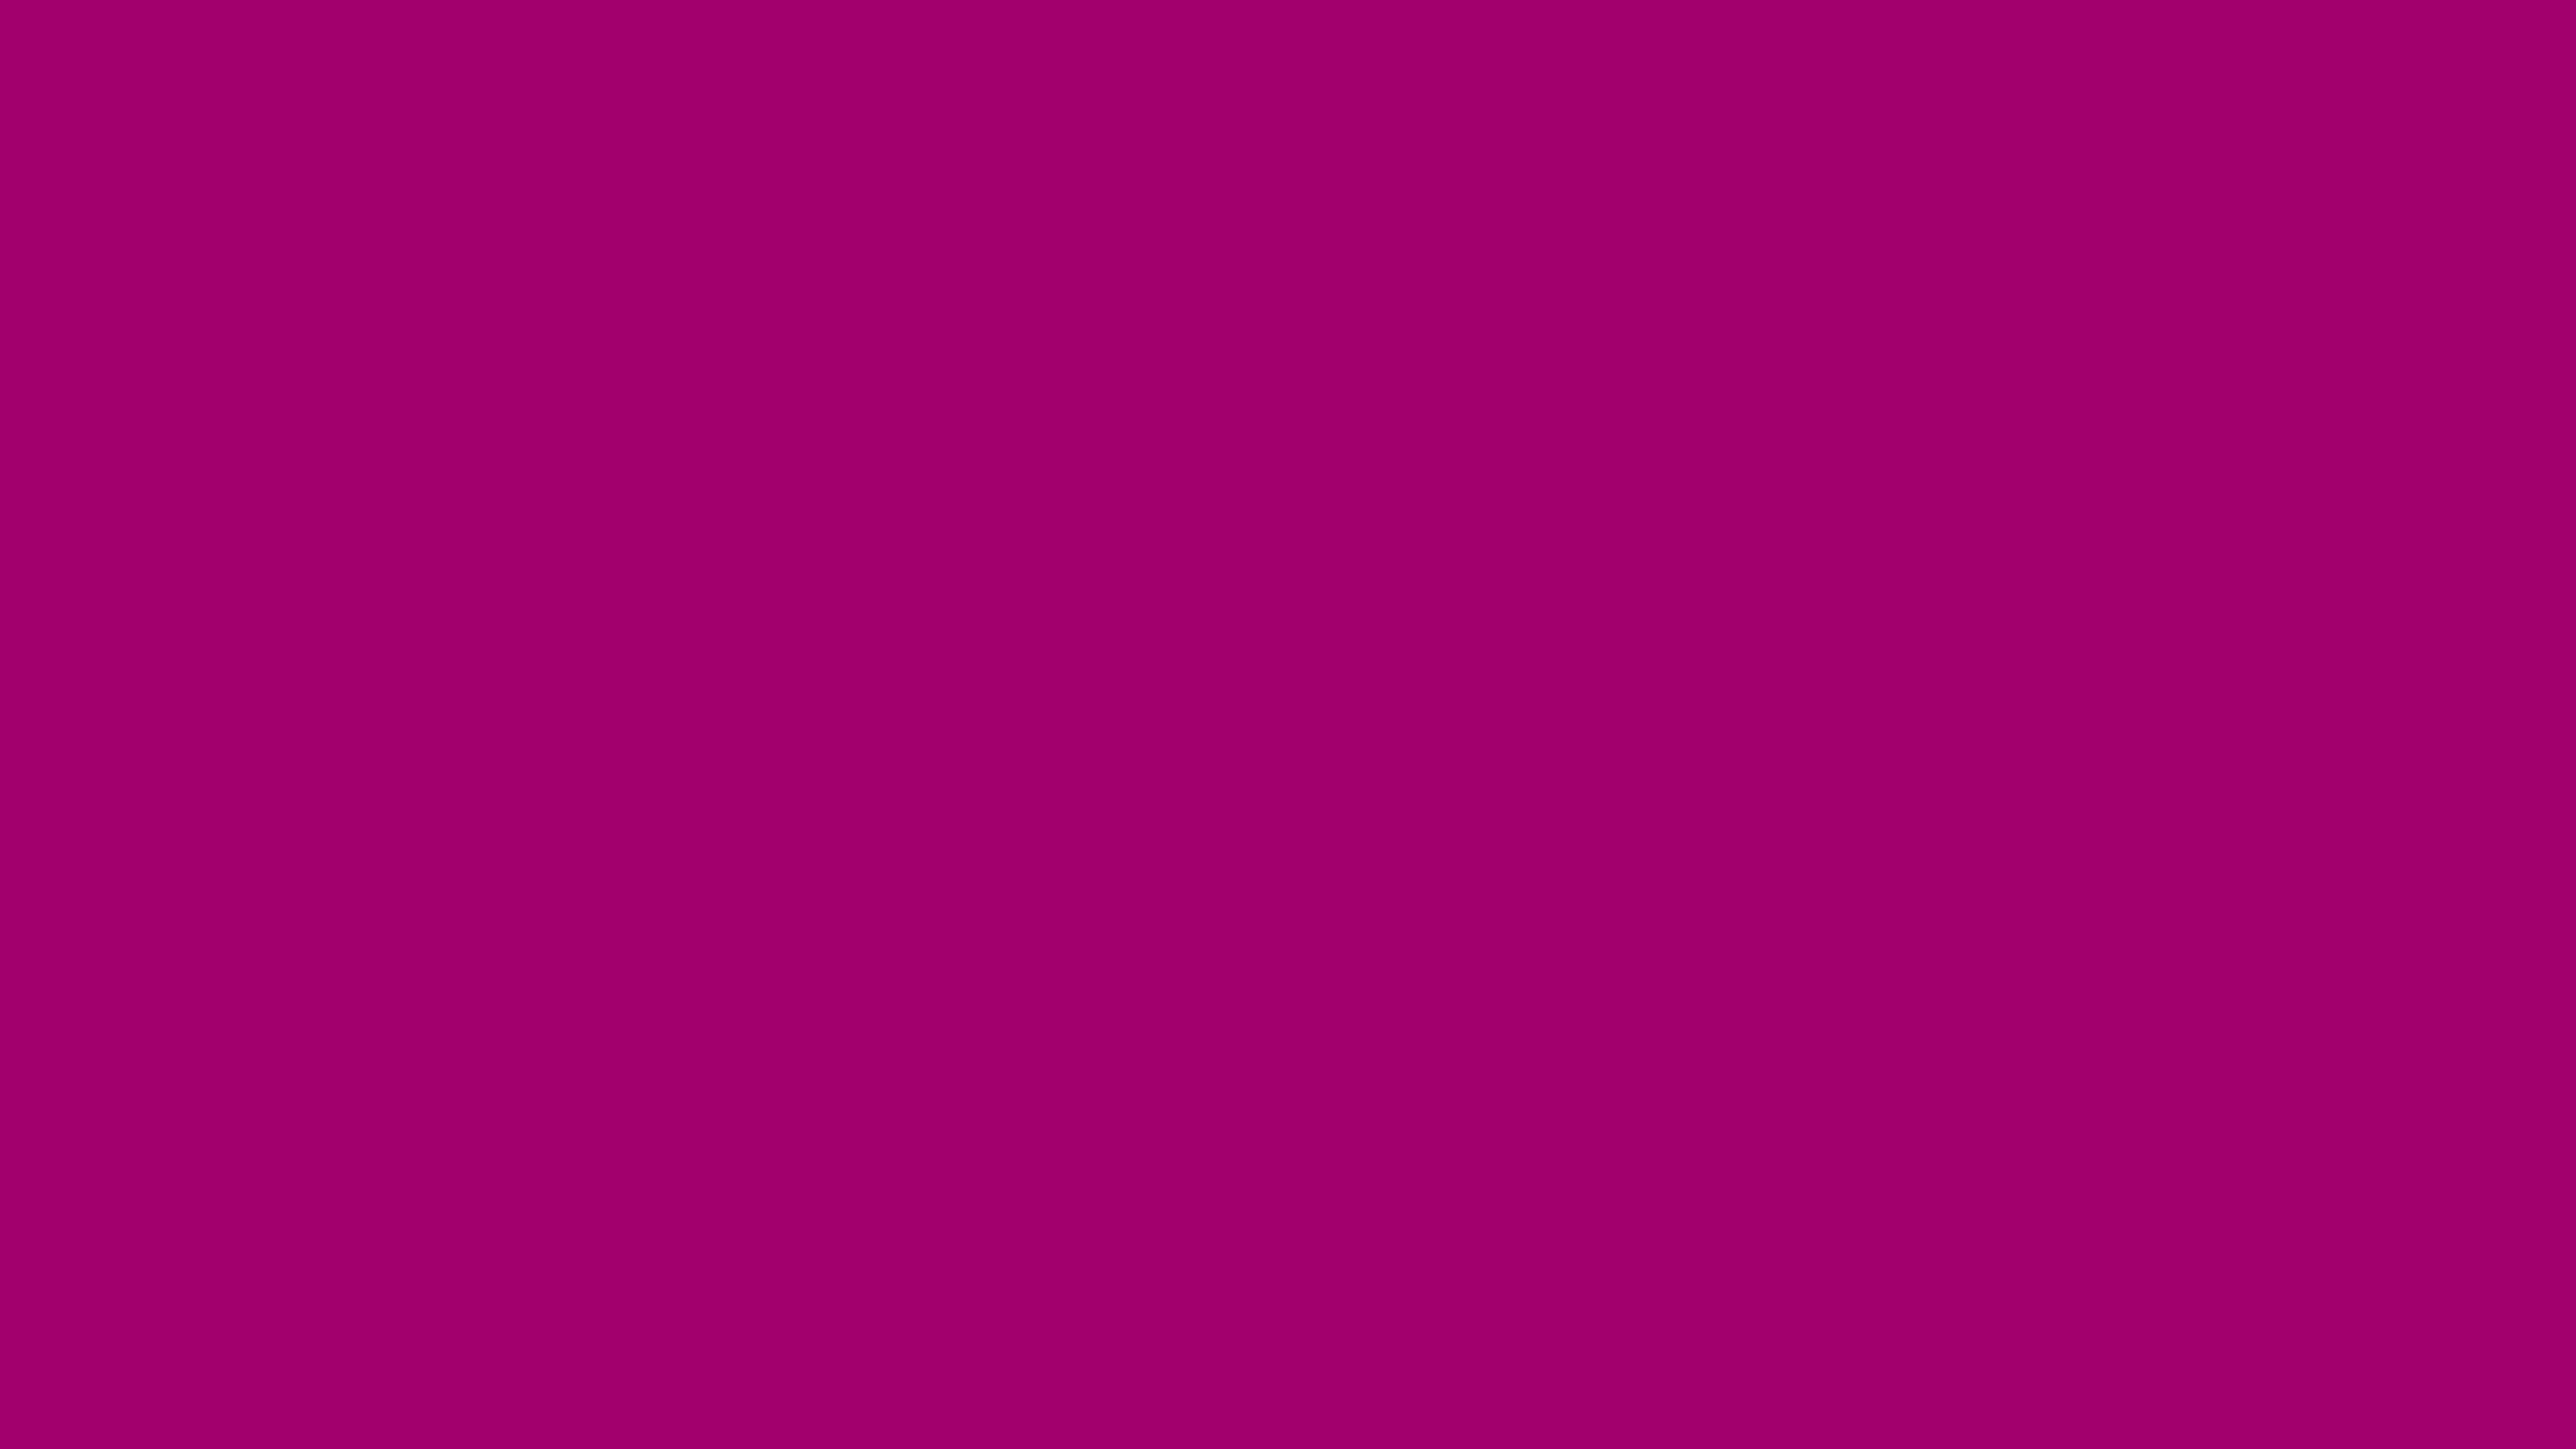 5120x2880 Flirt Solid Color Background